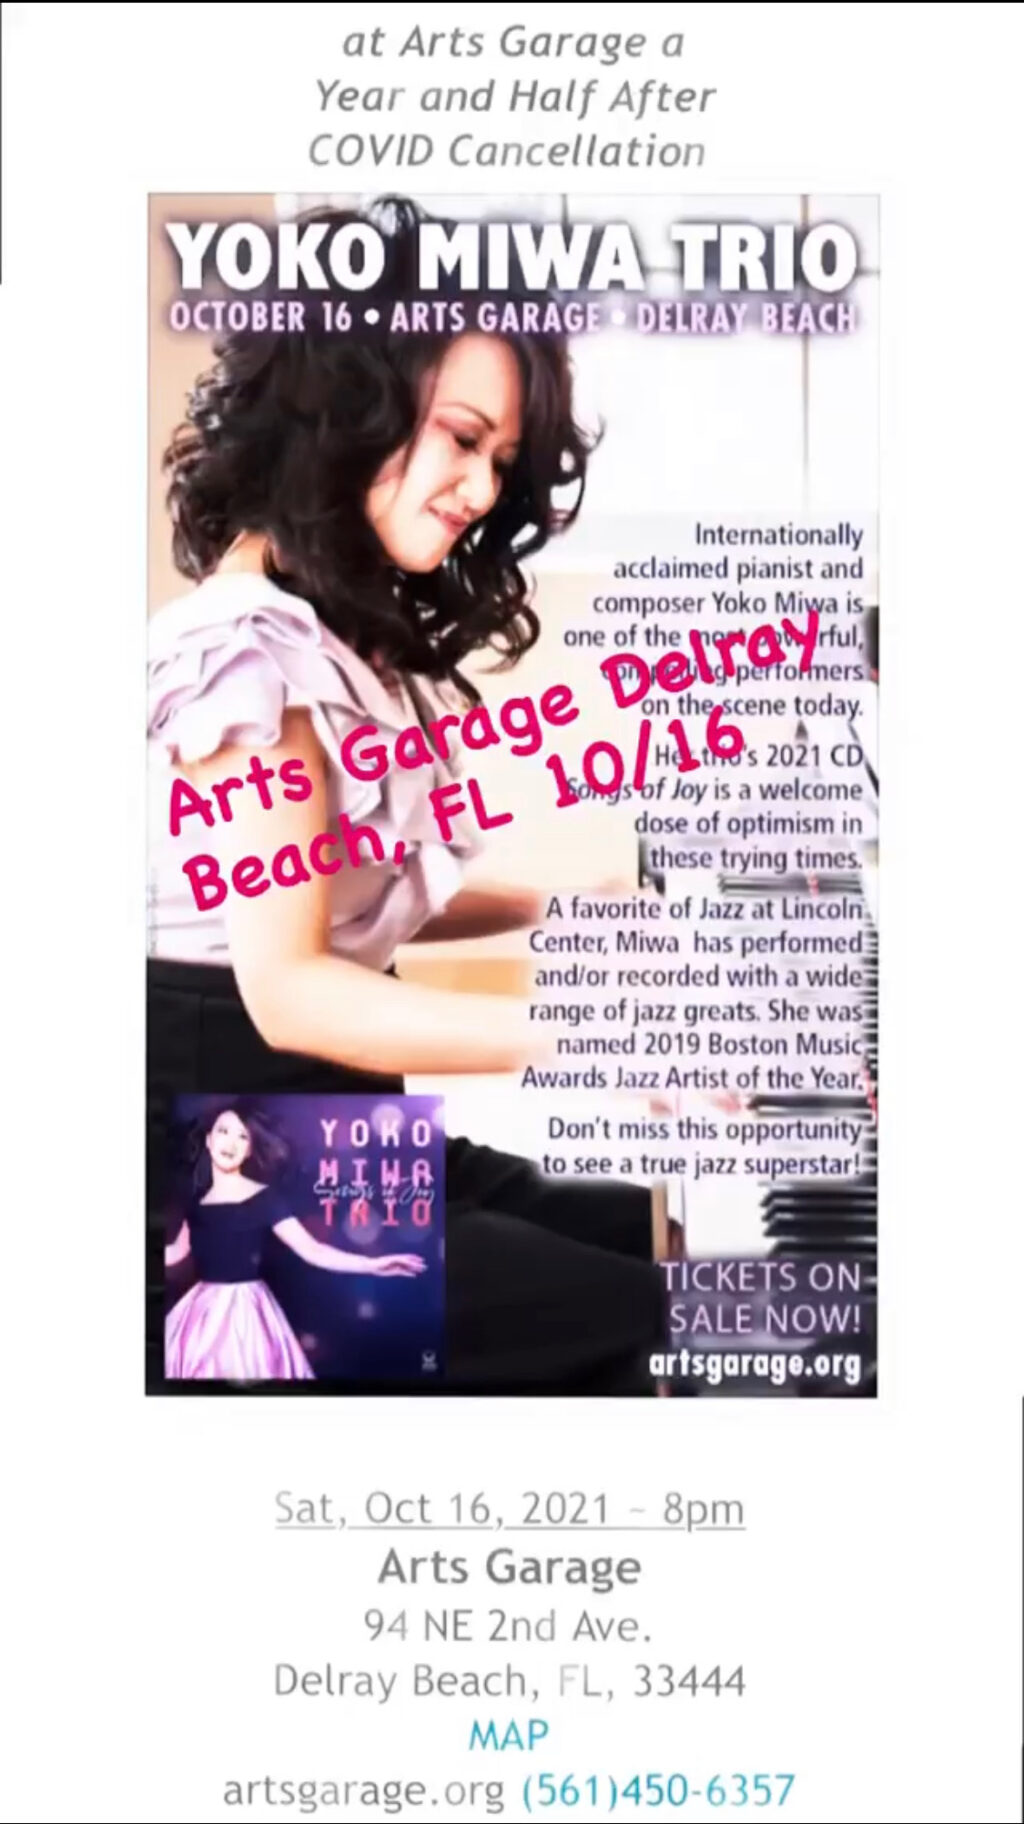 Yoko Miwa plays Arts Garage in Delray Beach, FL